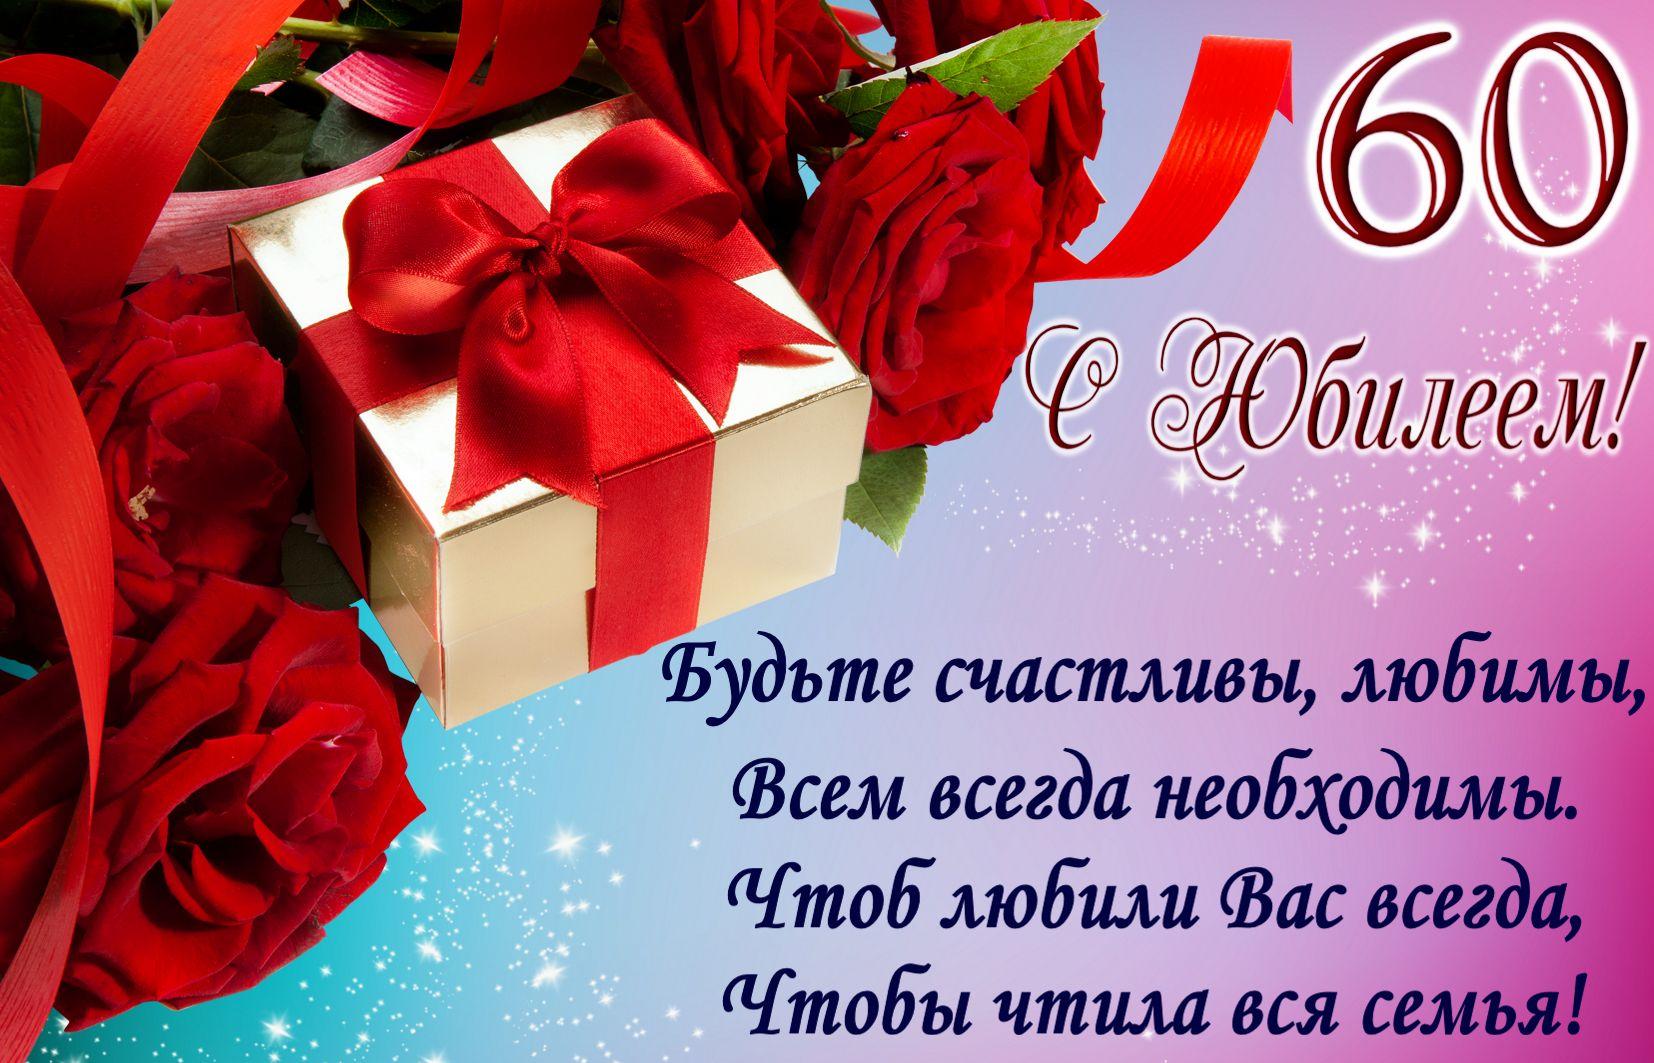 Открытка на 60 лет - пожелание с подарком и розами на юбилей